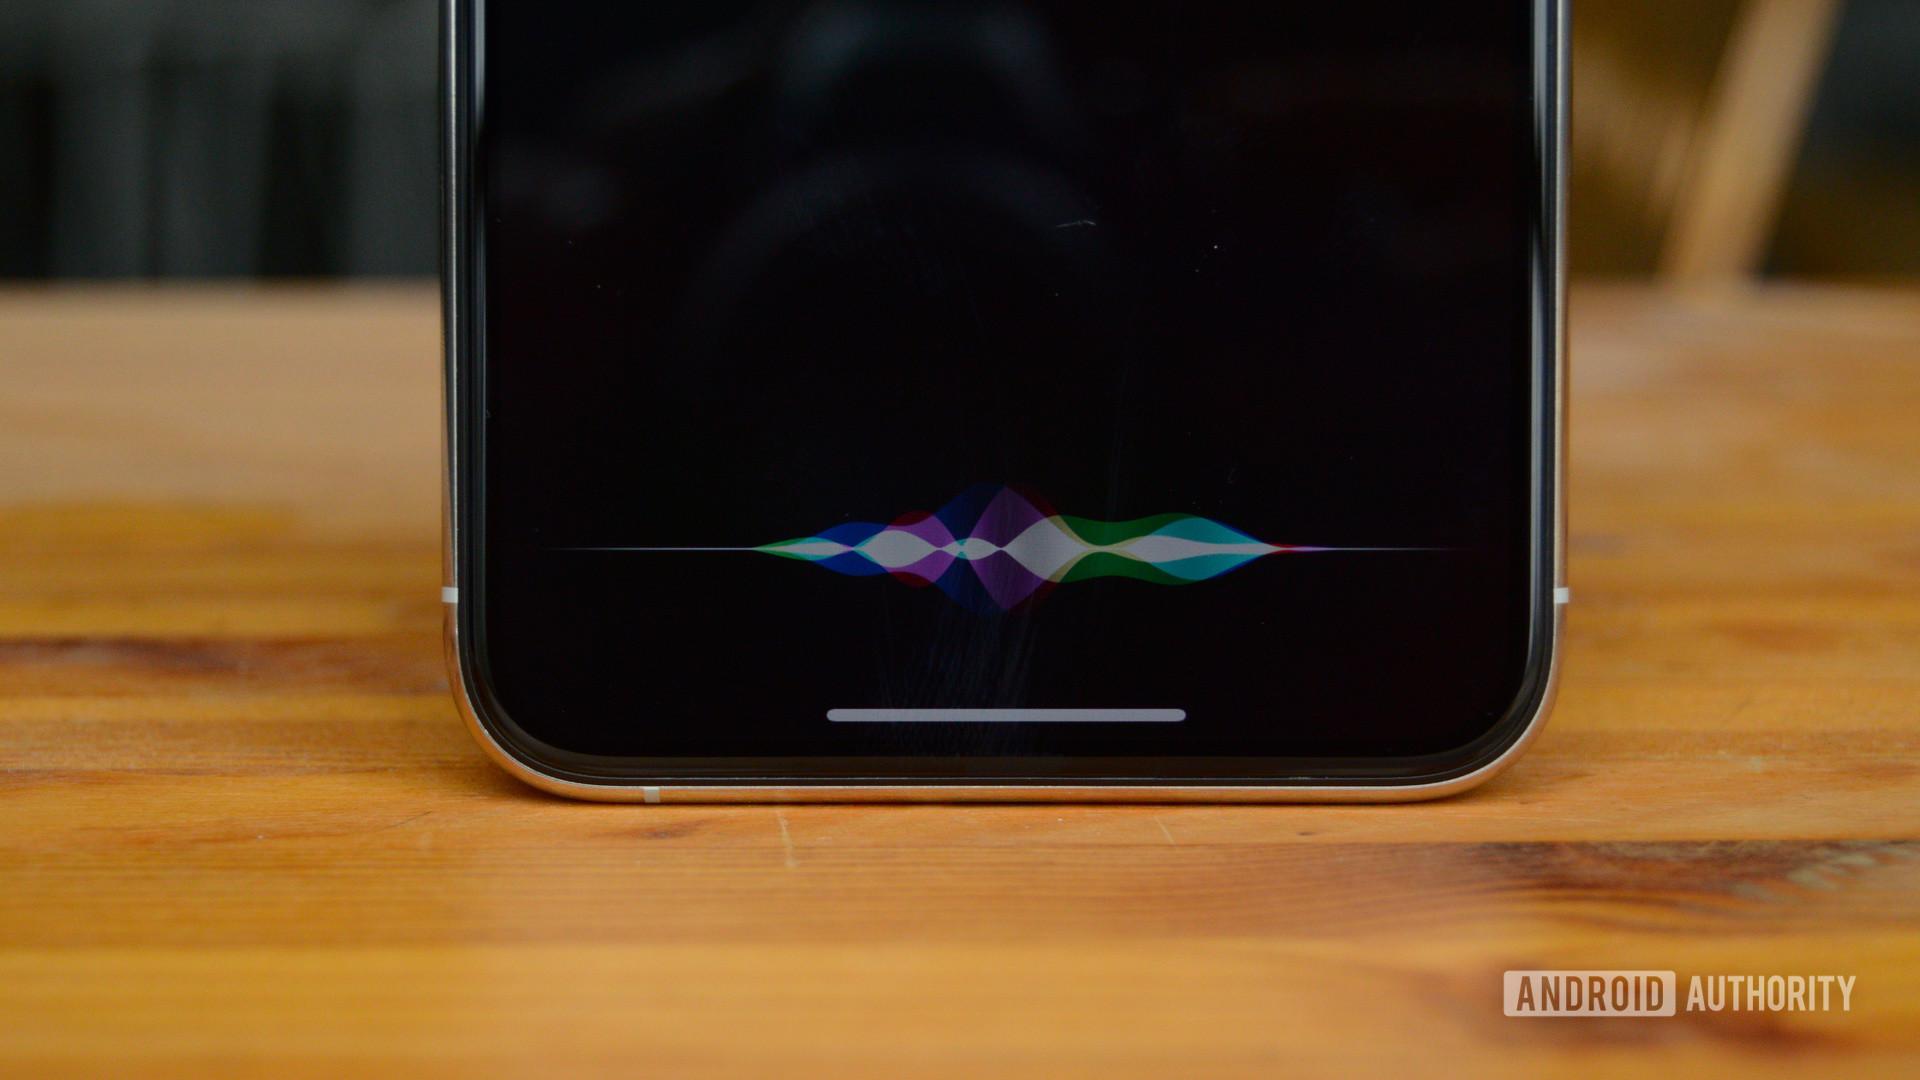 iPhone 11 Pro Max Siri